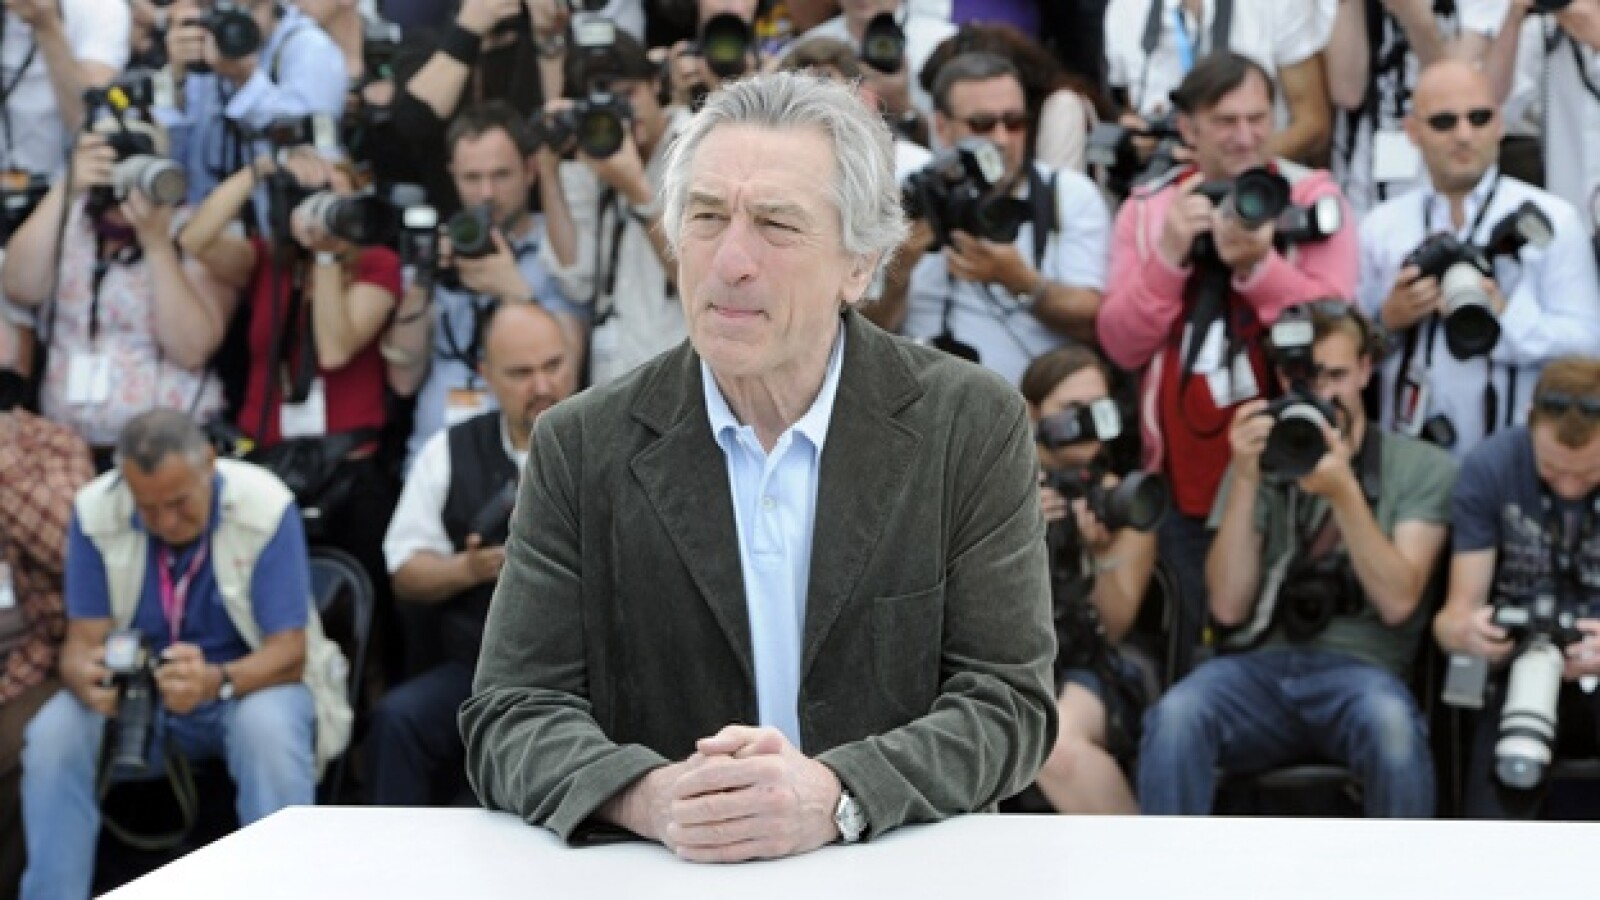 actor robert de niro posa ante las camaras